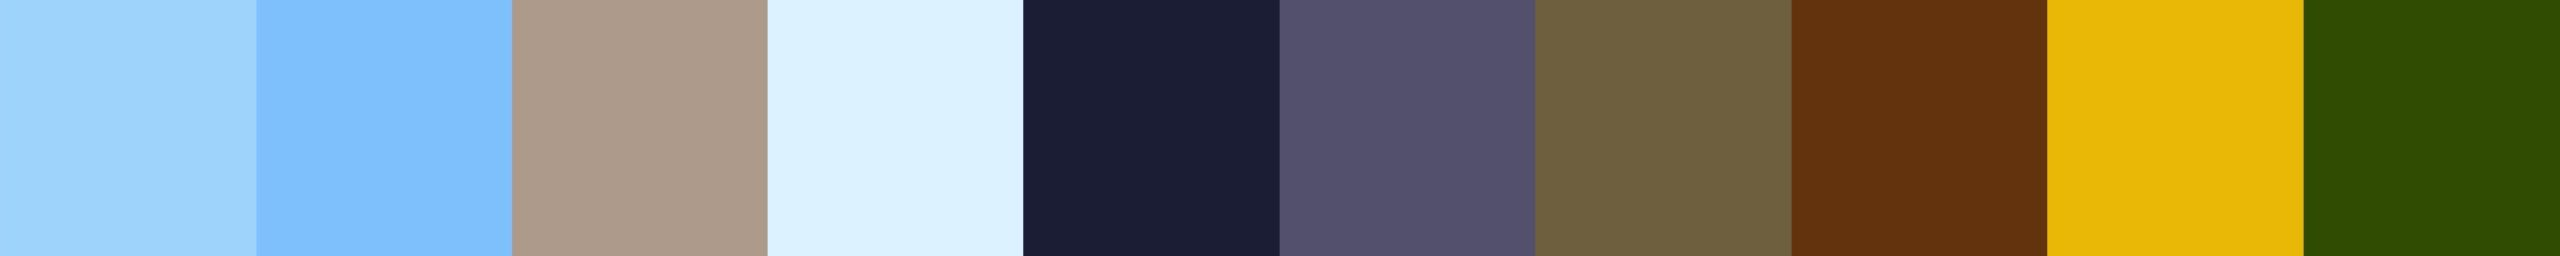 153 Moliawa Color Palette